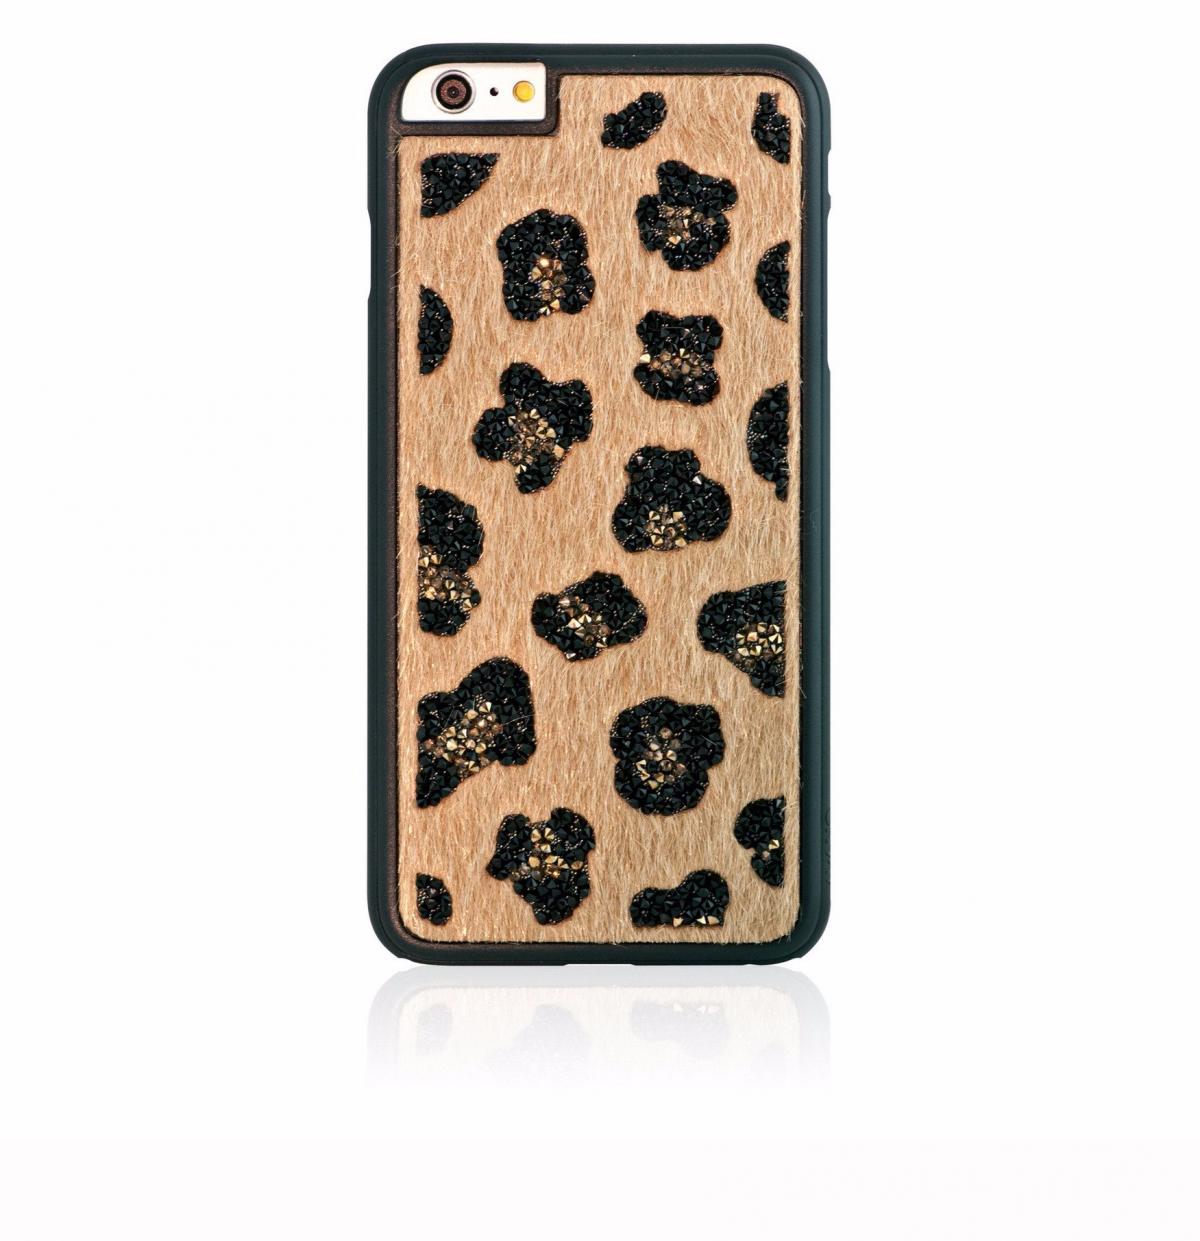 Чехол-накладка Bling My Thing Glam для Apple iPhone 6 Plus/6S Plus Leopard Beigeдля iPhone 6 Plus/6S Plus<br>Чехол-накладка Bling My Thing Glam для Apple iPhone 6 Plus/6S Plus Leopard Beige<br>